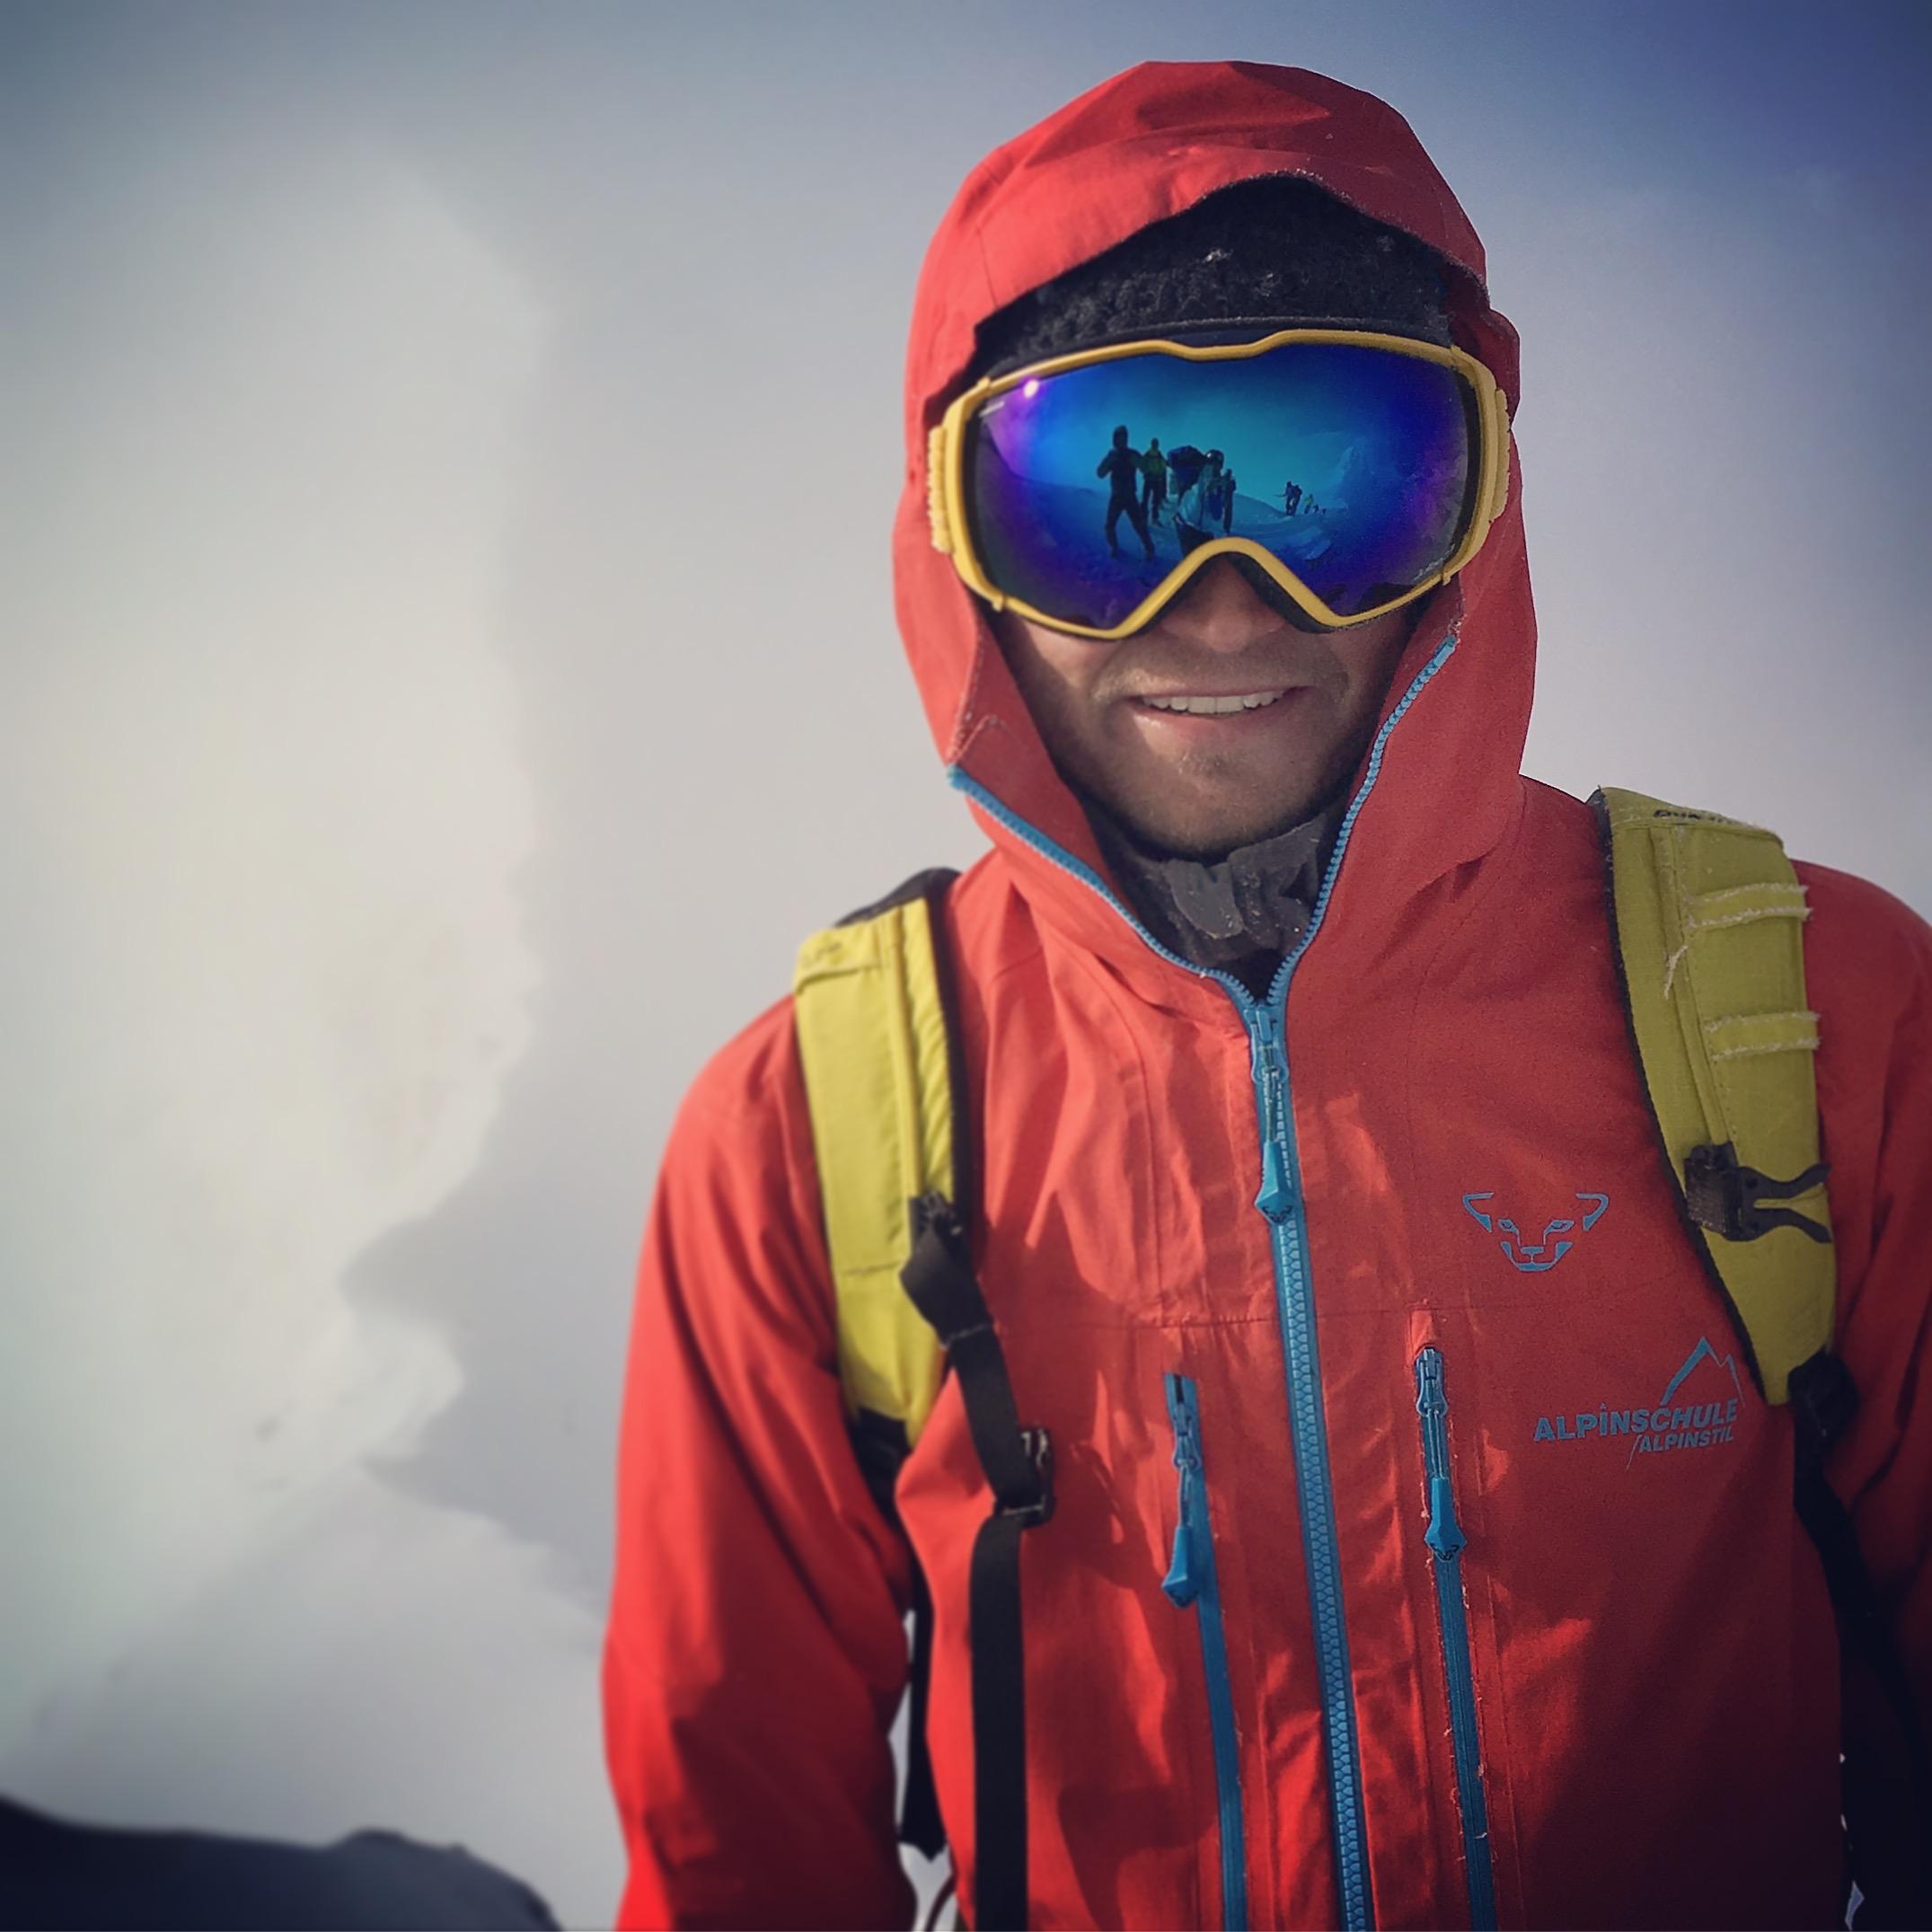 Jürgen Reinmüller Lofoten Skitourenreise Bergführer Alpinschule Alpinstil